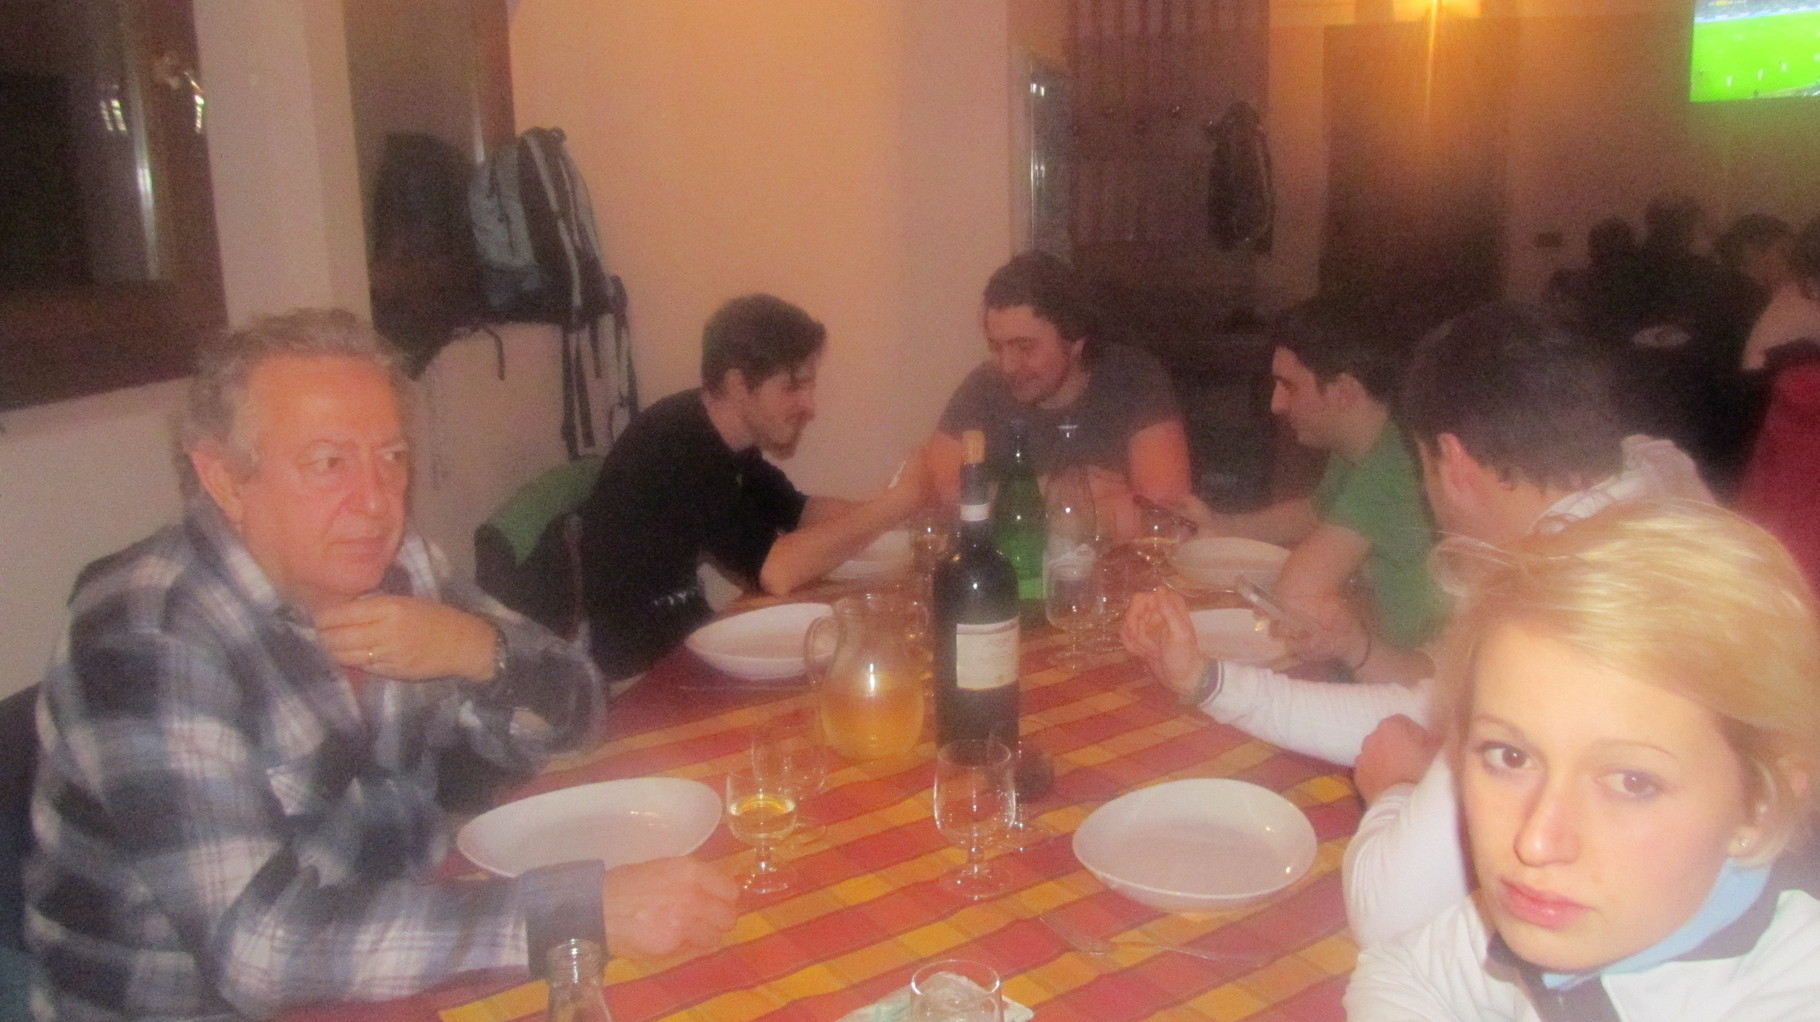 GABRIO, LORENZO, PAOLO, JACOPO, LUCIA